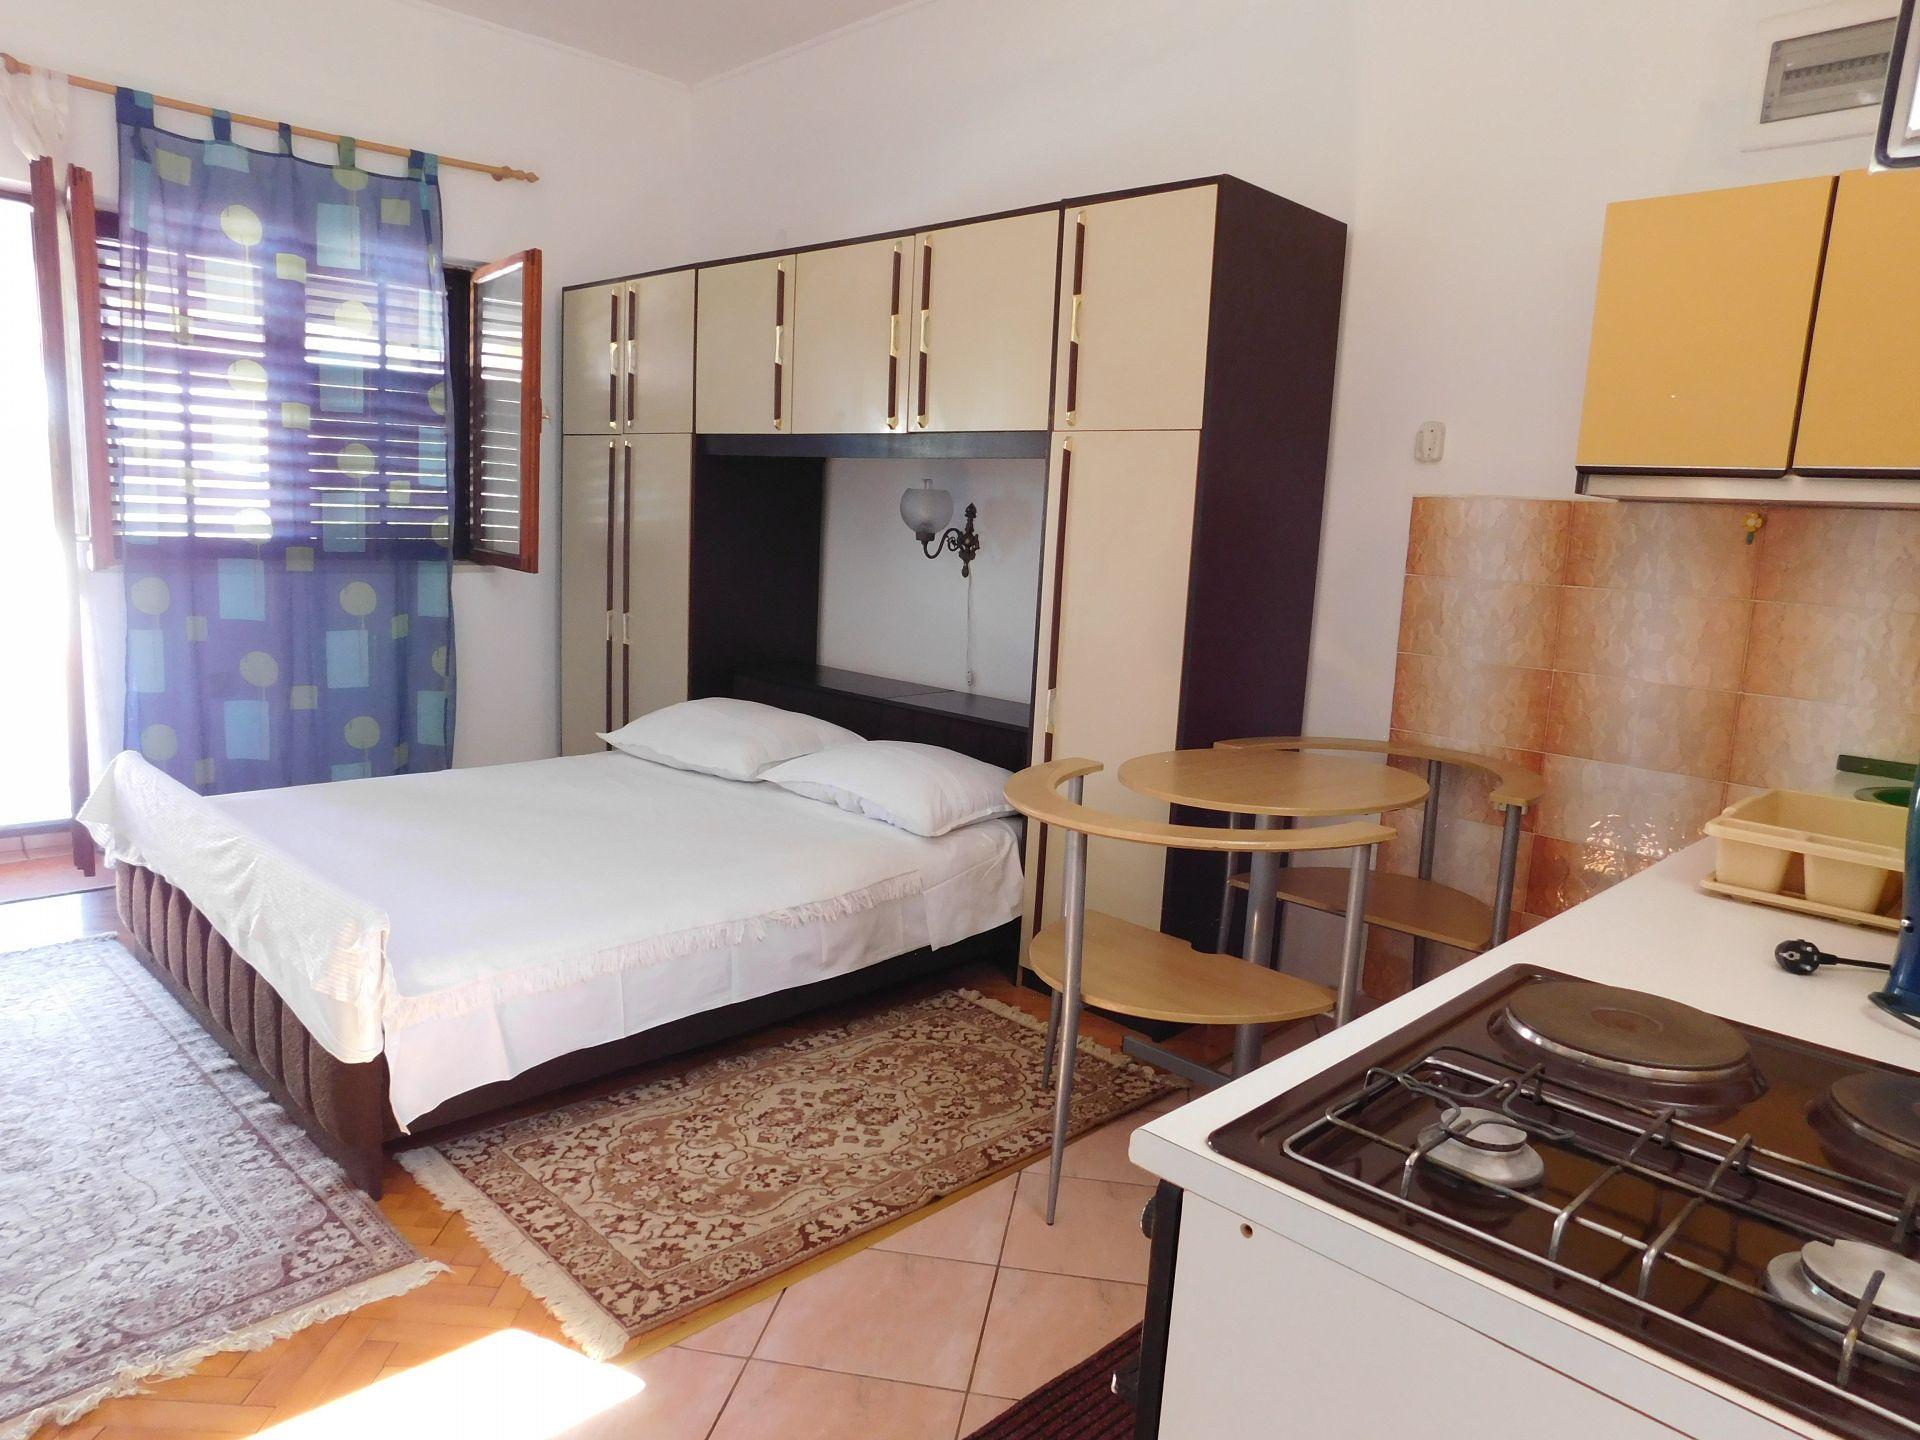 Ferienwohnung Lado SA2(2+1) - Muline (741847), Ugljan, Insel Ugljan, Dalmatien, Kroatien, Bild 15